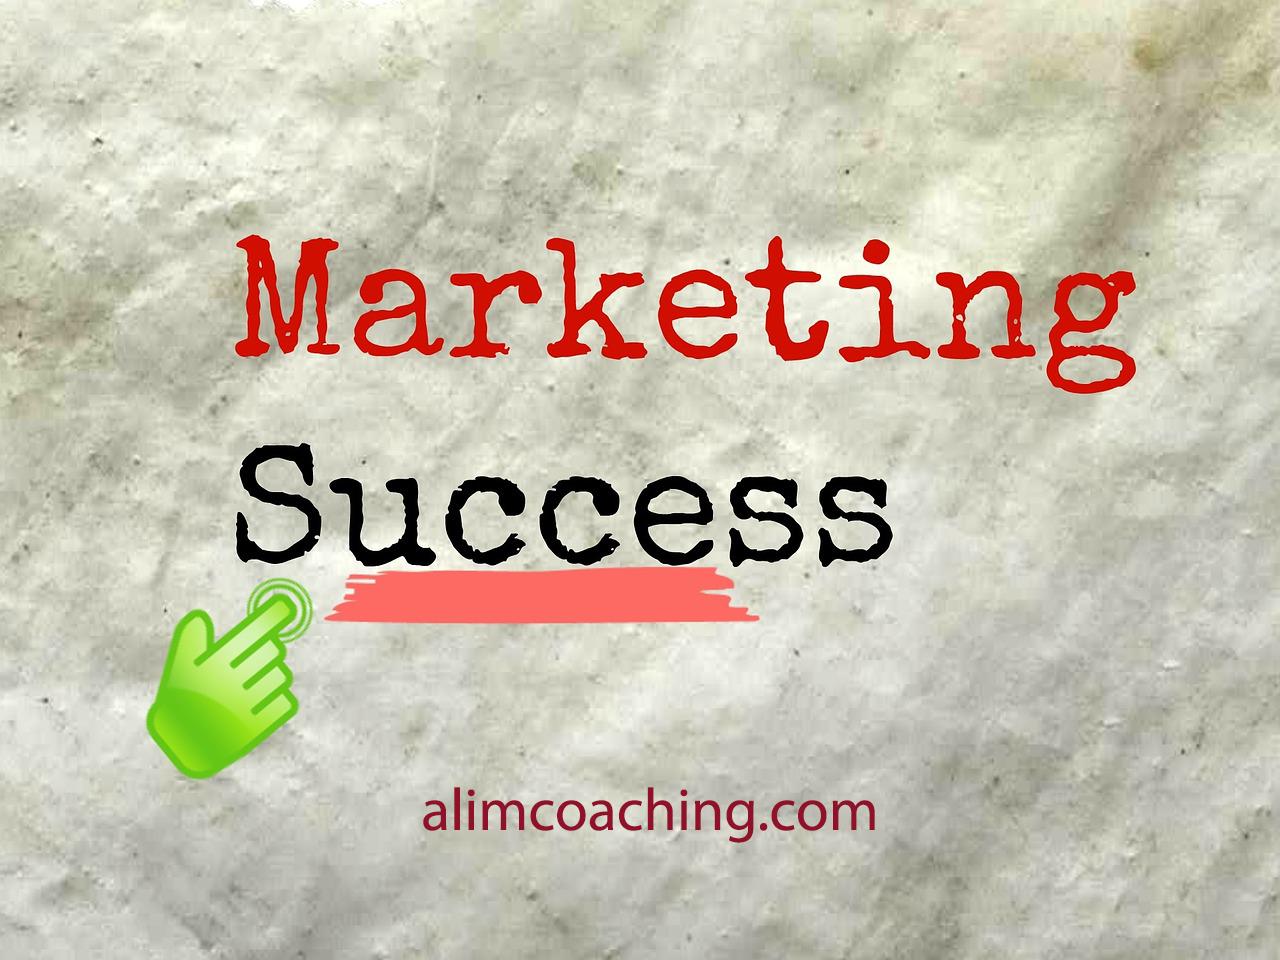 Internet Marketing Success for Beginners